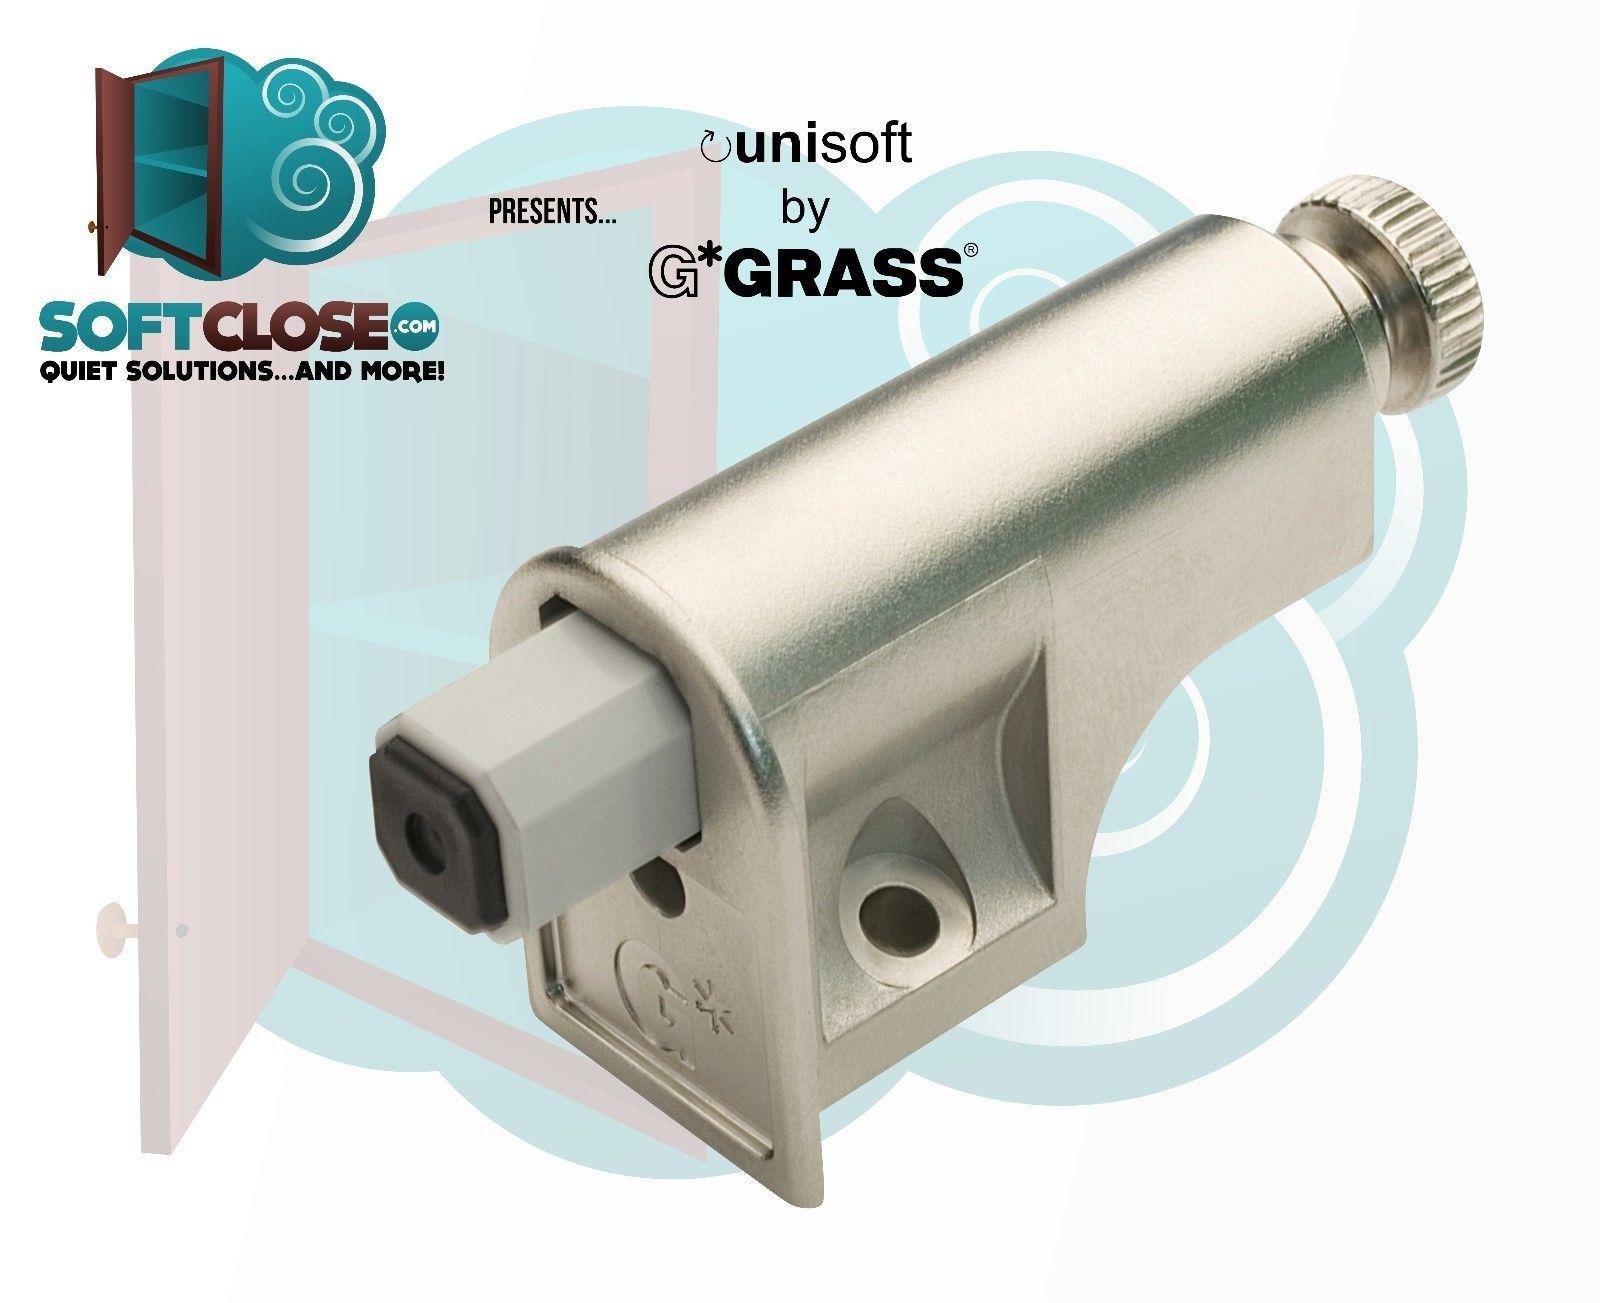 Details about (10) Grass Unisoft Universal SoftClose